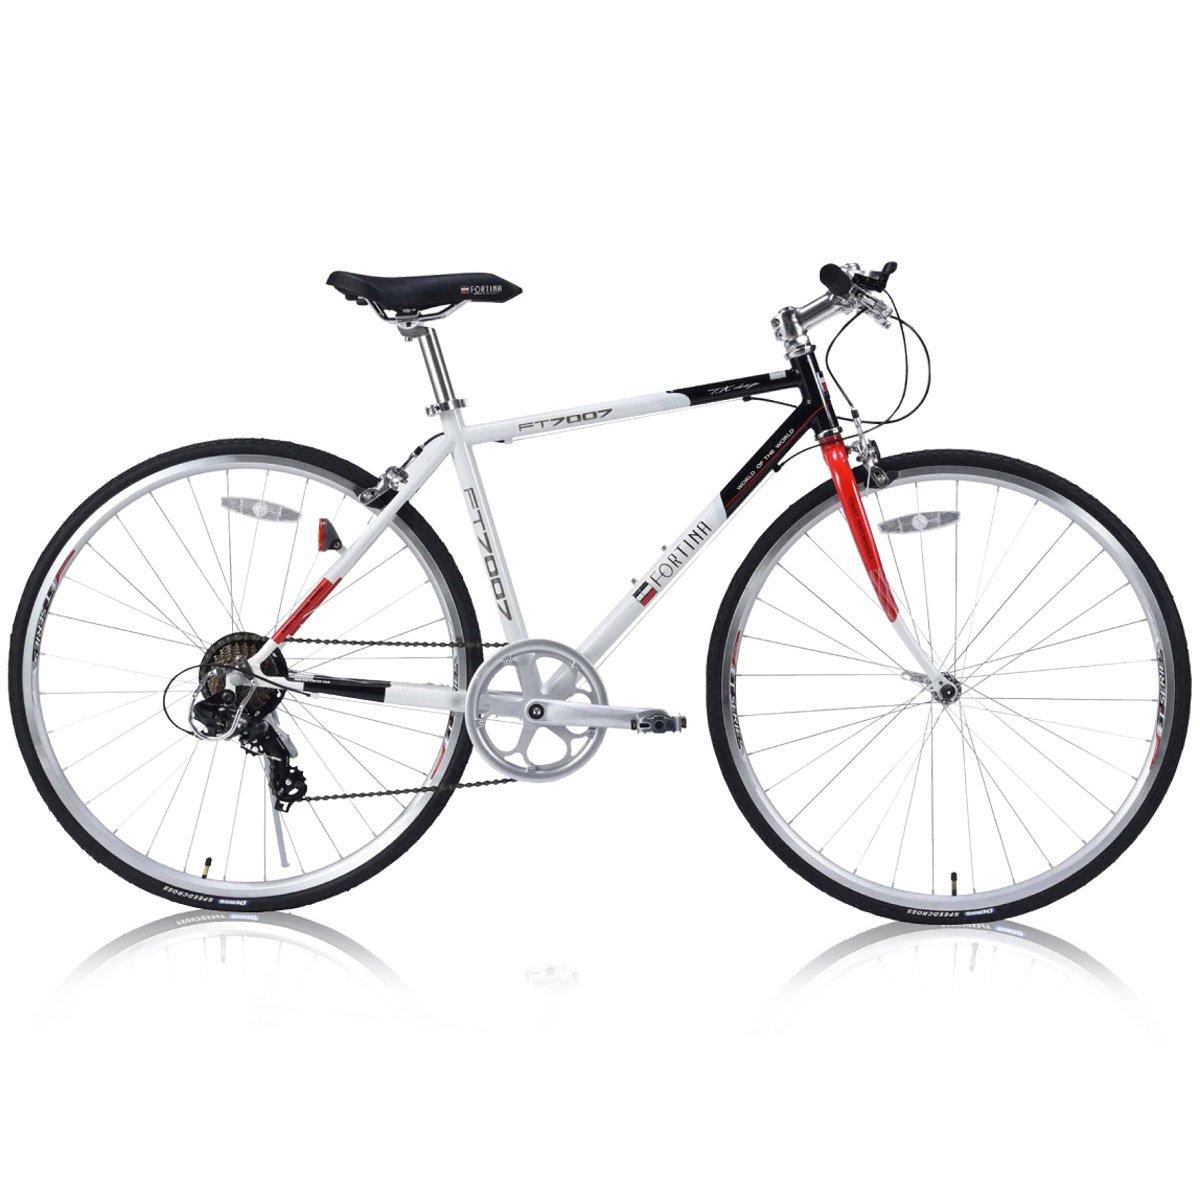 FORTINA(フォルティナ) FT-7007 クロスバイク700C シマノ製7段変速付(サムシフター) 軽量設計 クイックレリーズ 高さ調整可能Aヘッドスタイルステム B07D59LVMYスノーパールトリコ